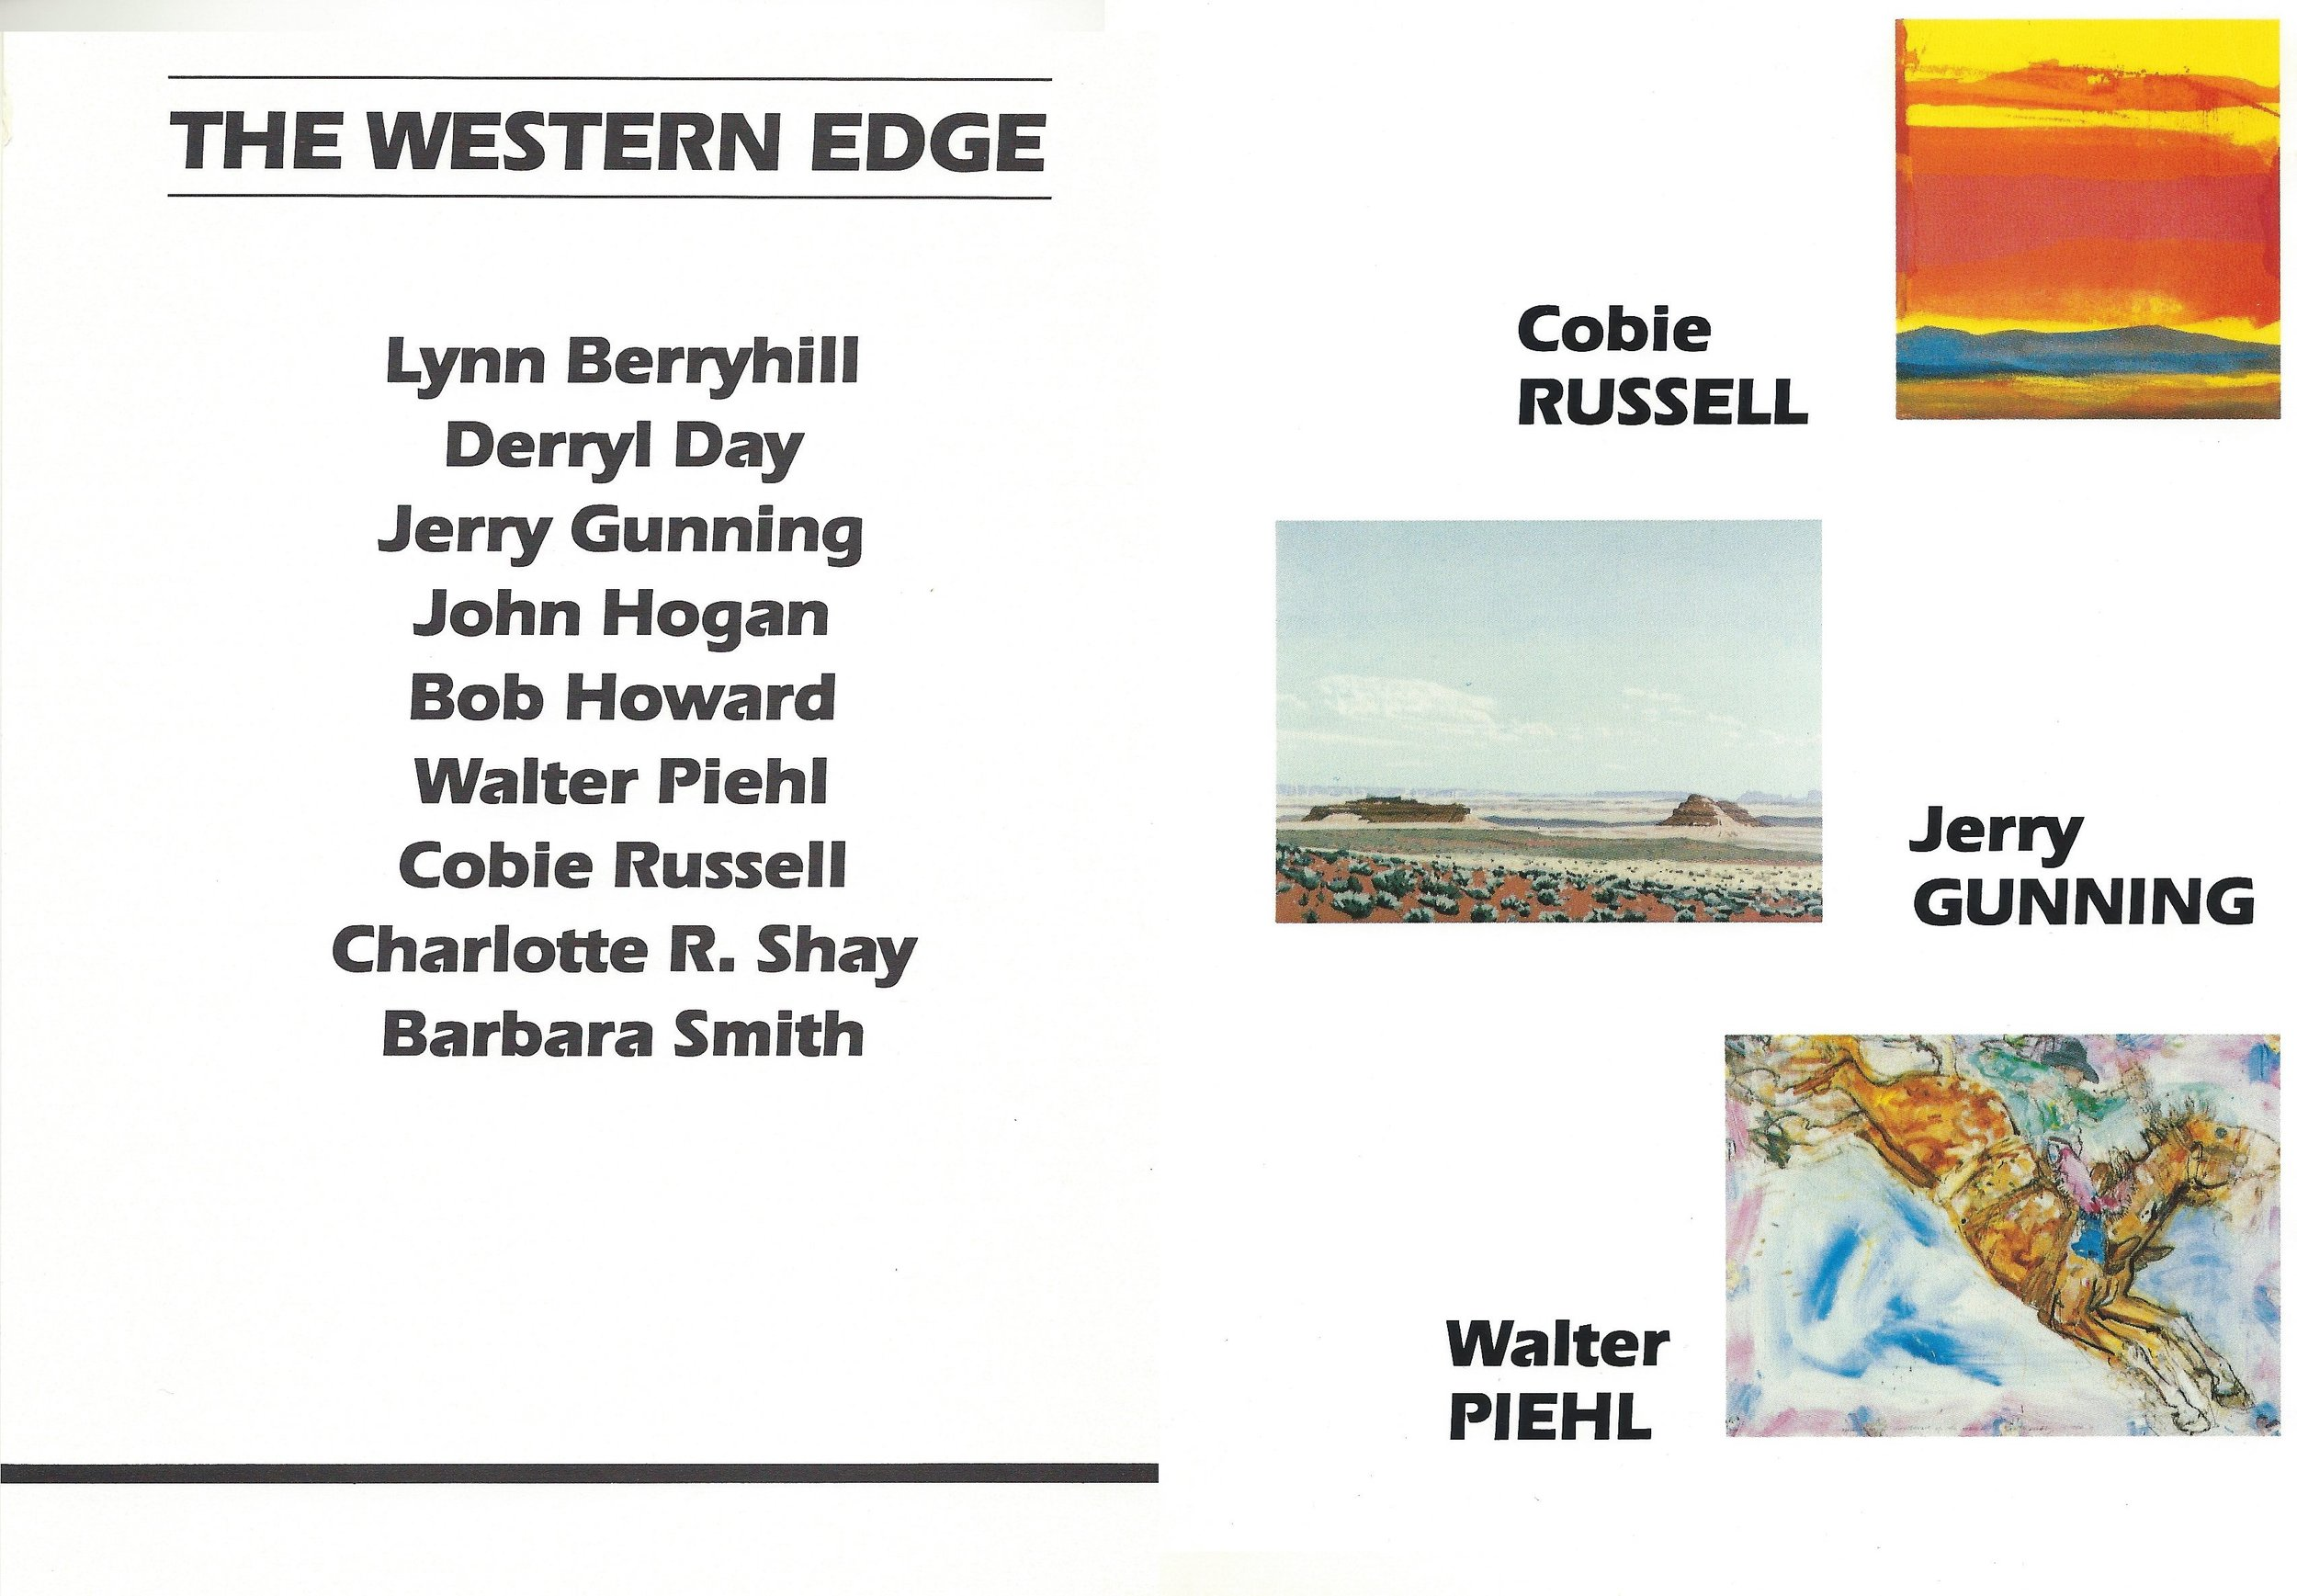 Western04 copy.JPG